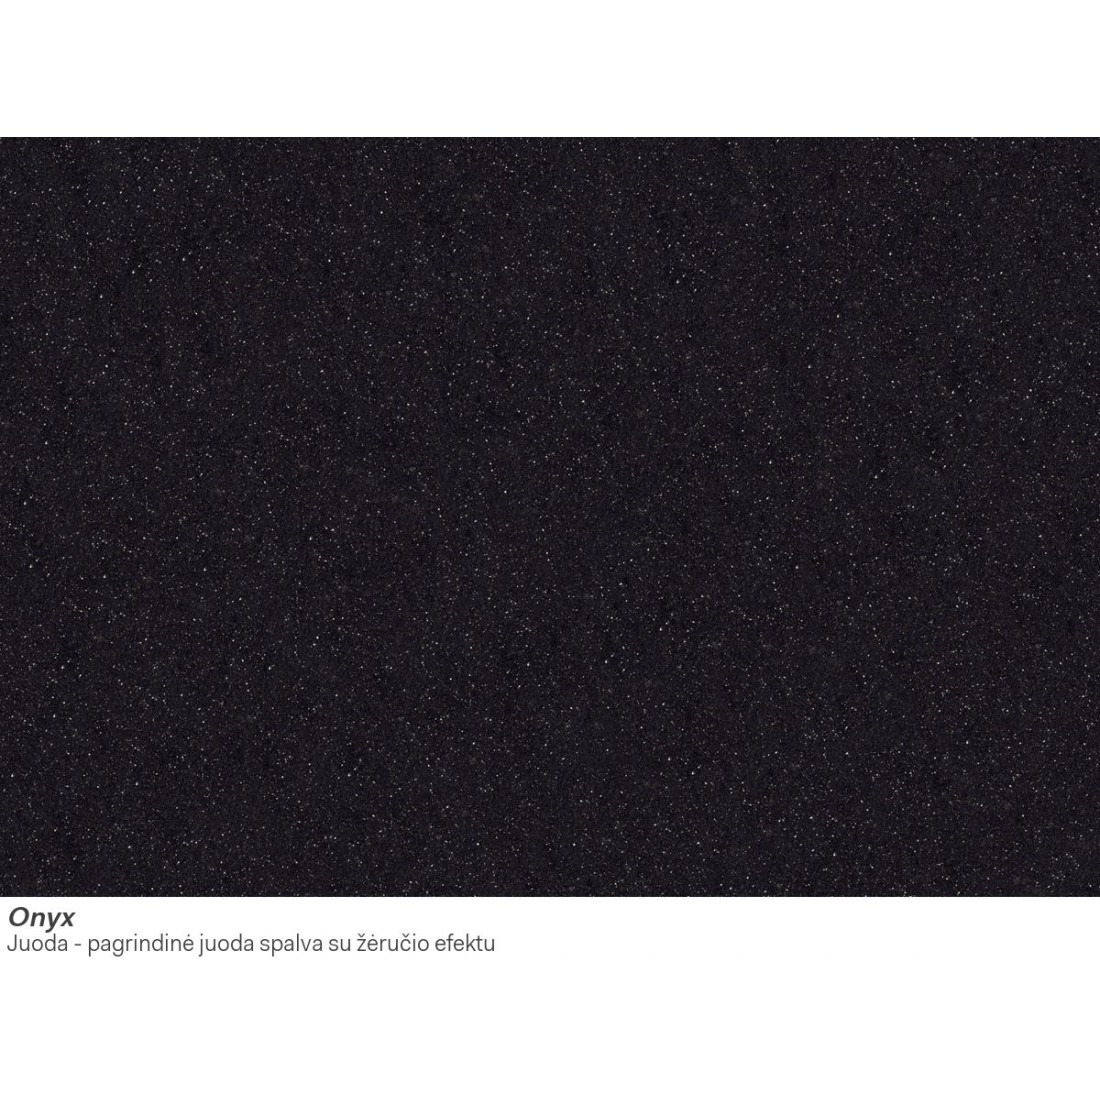 Akmens masės plautuvė Franke Maris MRG 651-78, Onyx